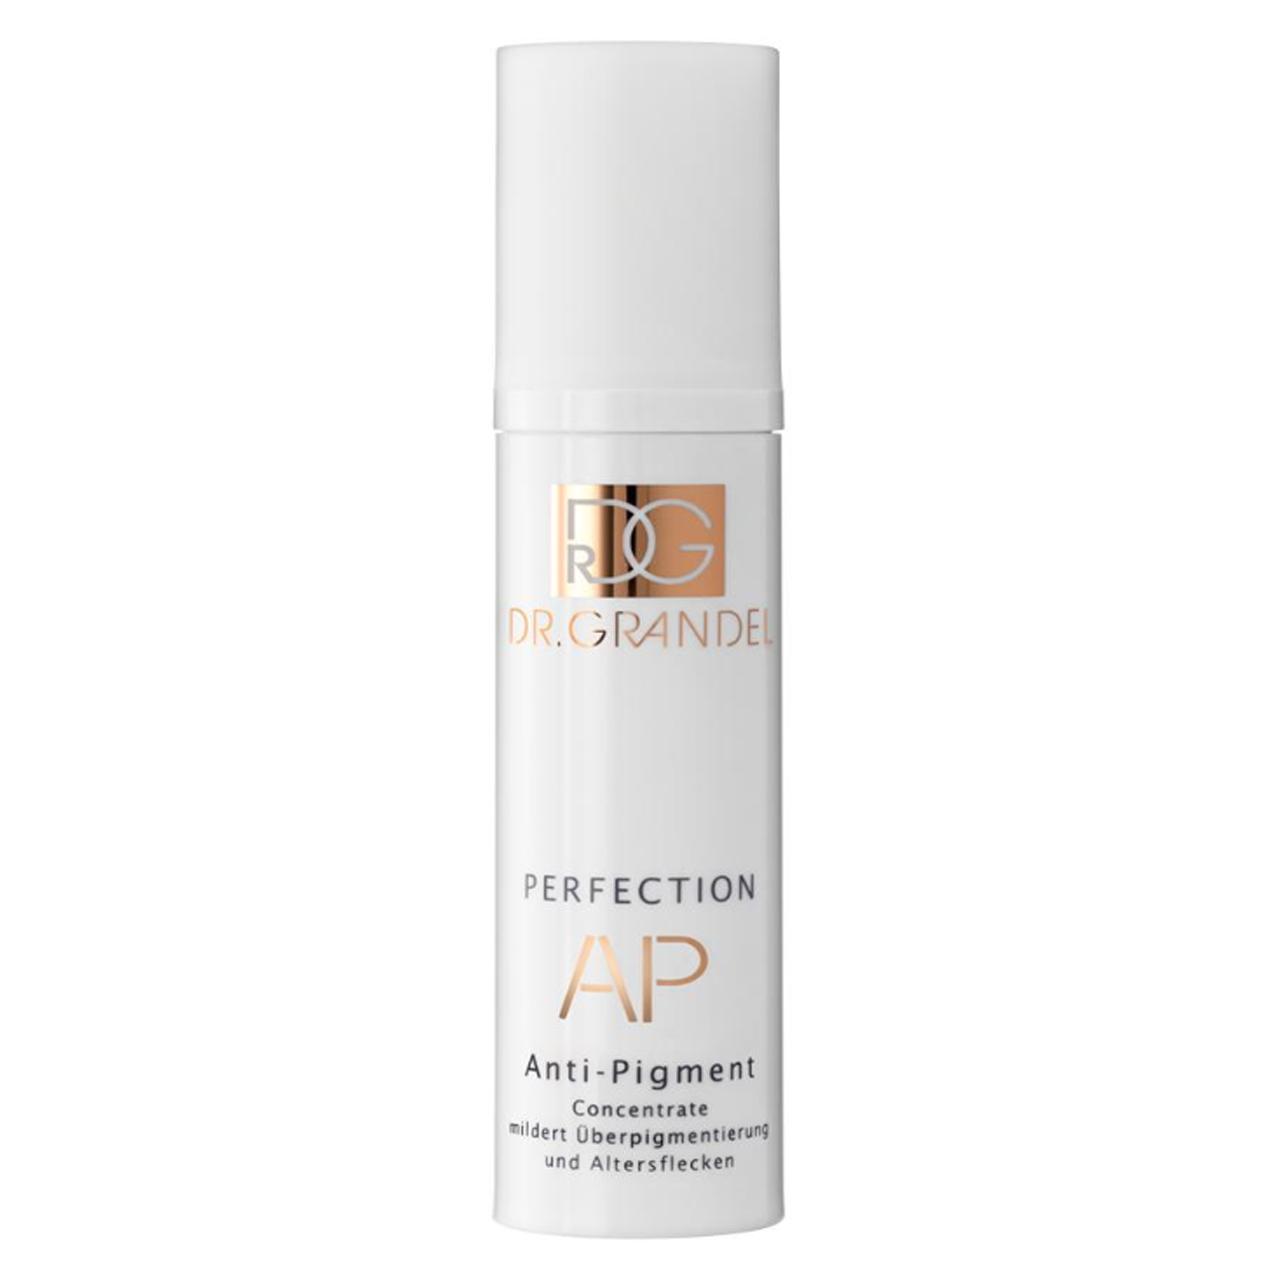 عکس فلوئید ضد لک دکتر گرندل مدل Perfection AP حجم 50 میلی لیتر